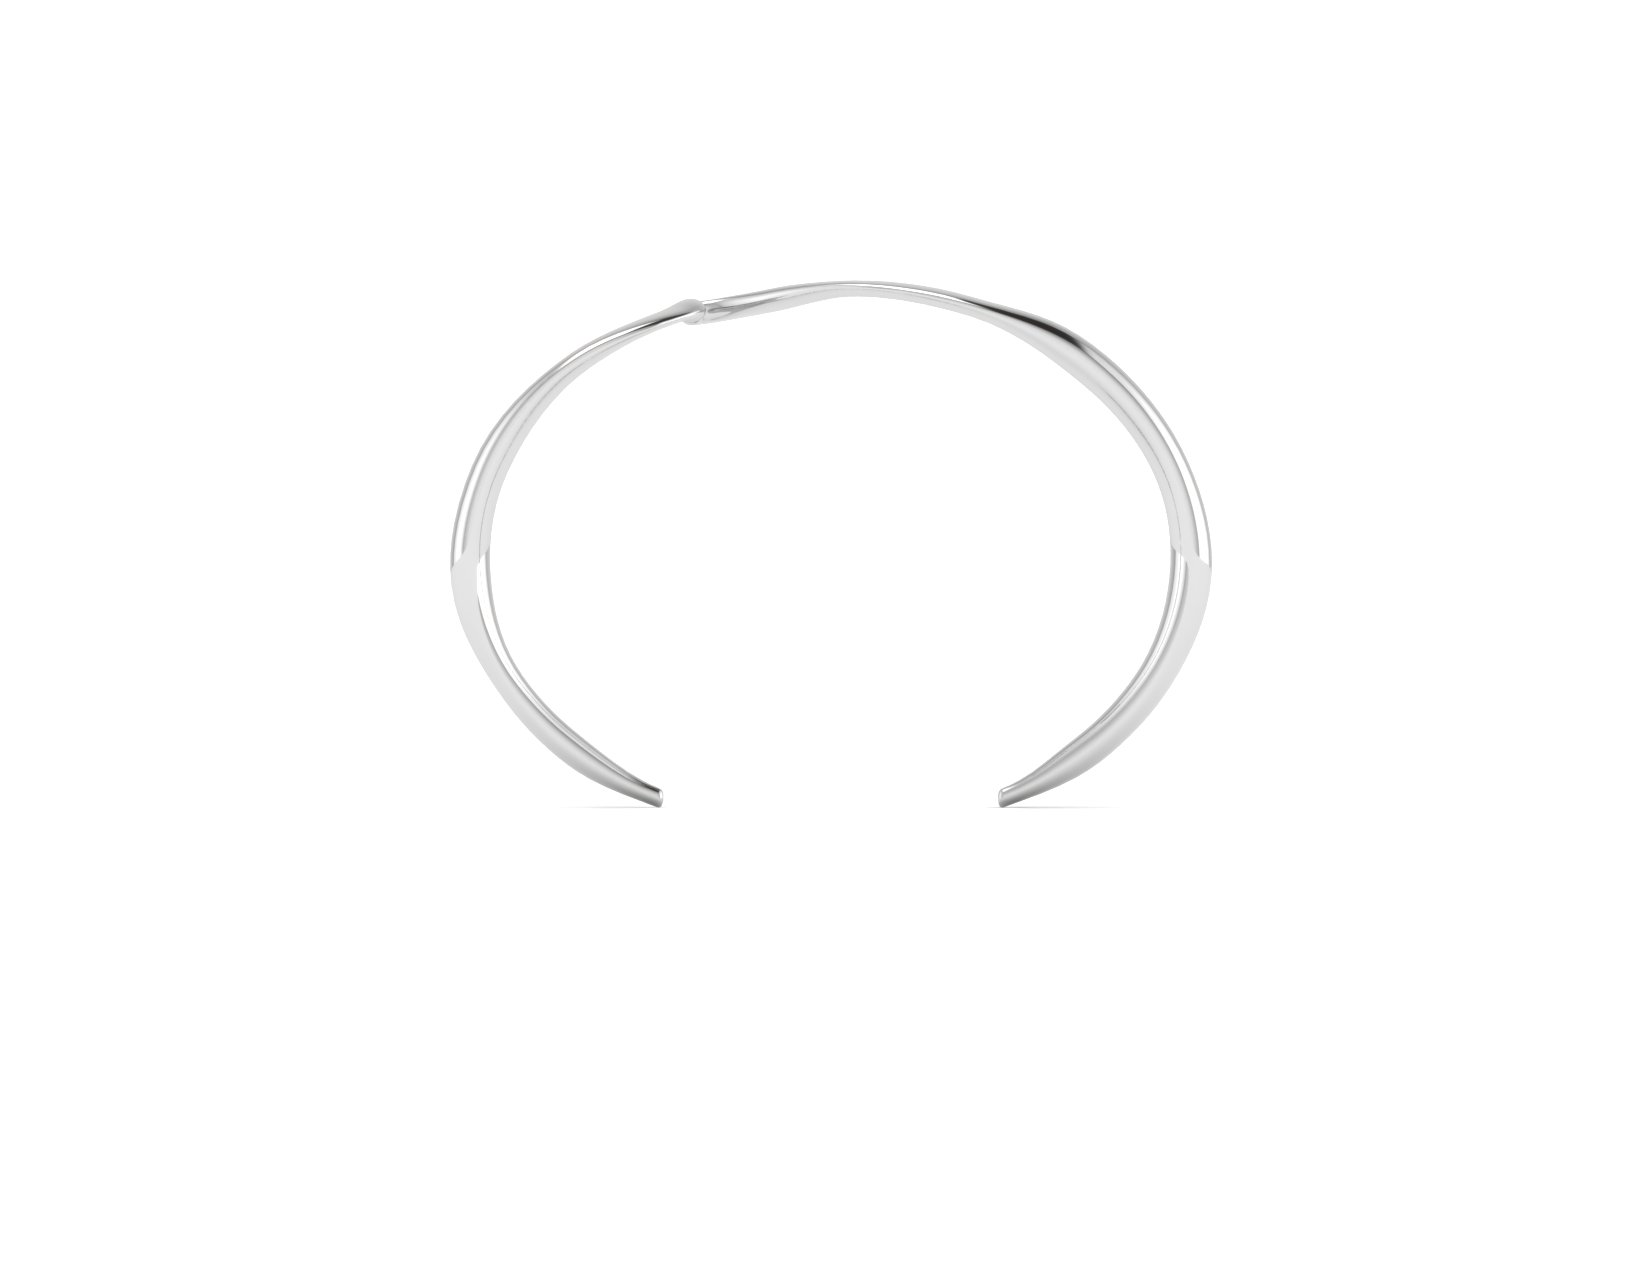 wrist bone bracelet left side.jpg